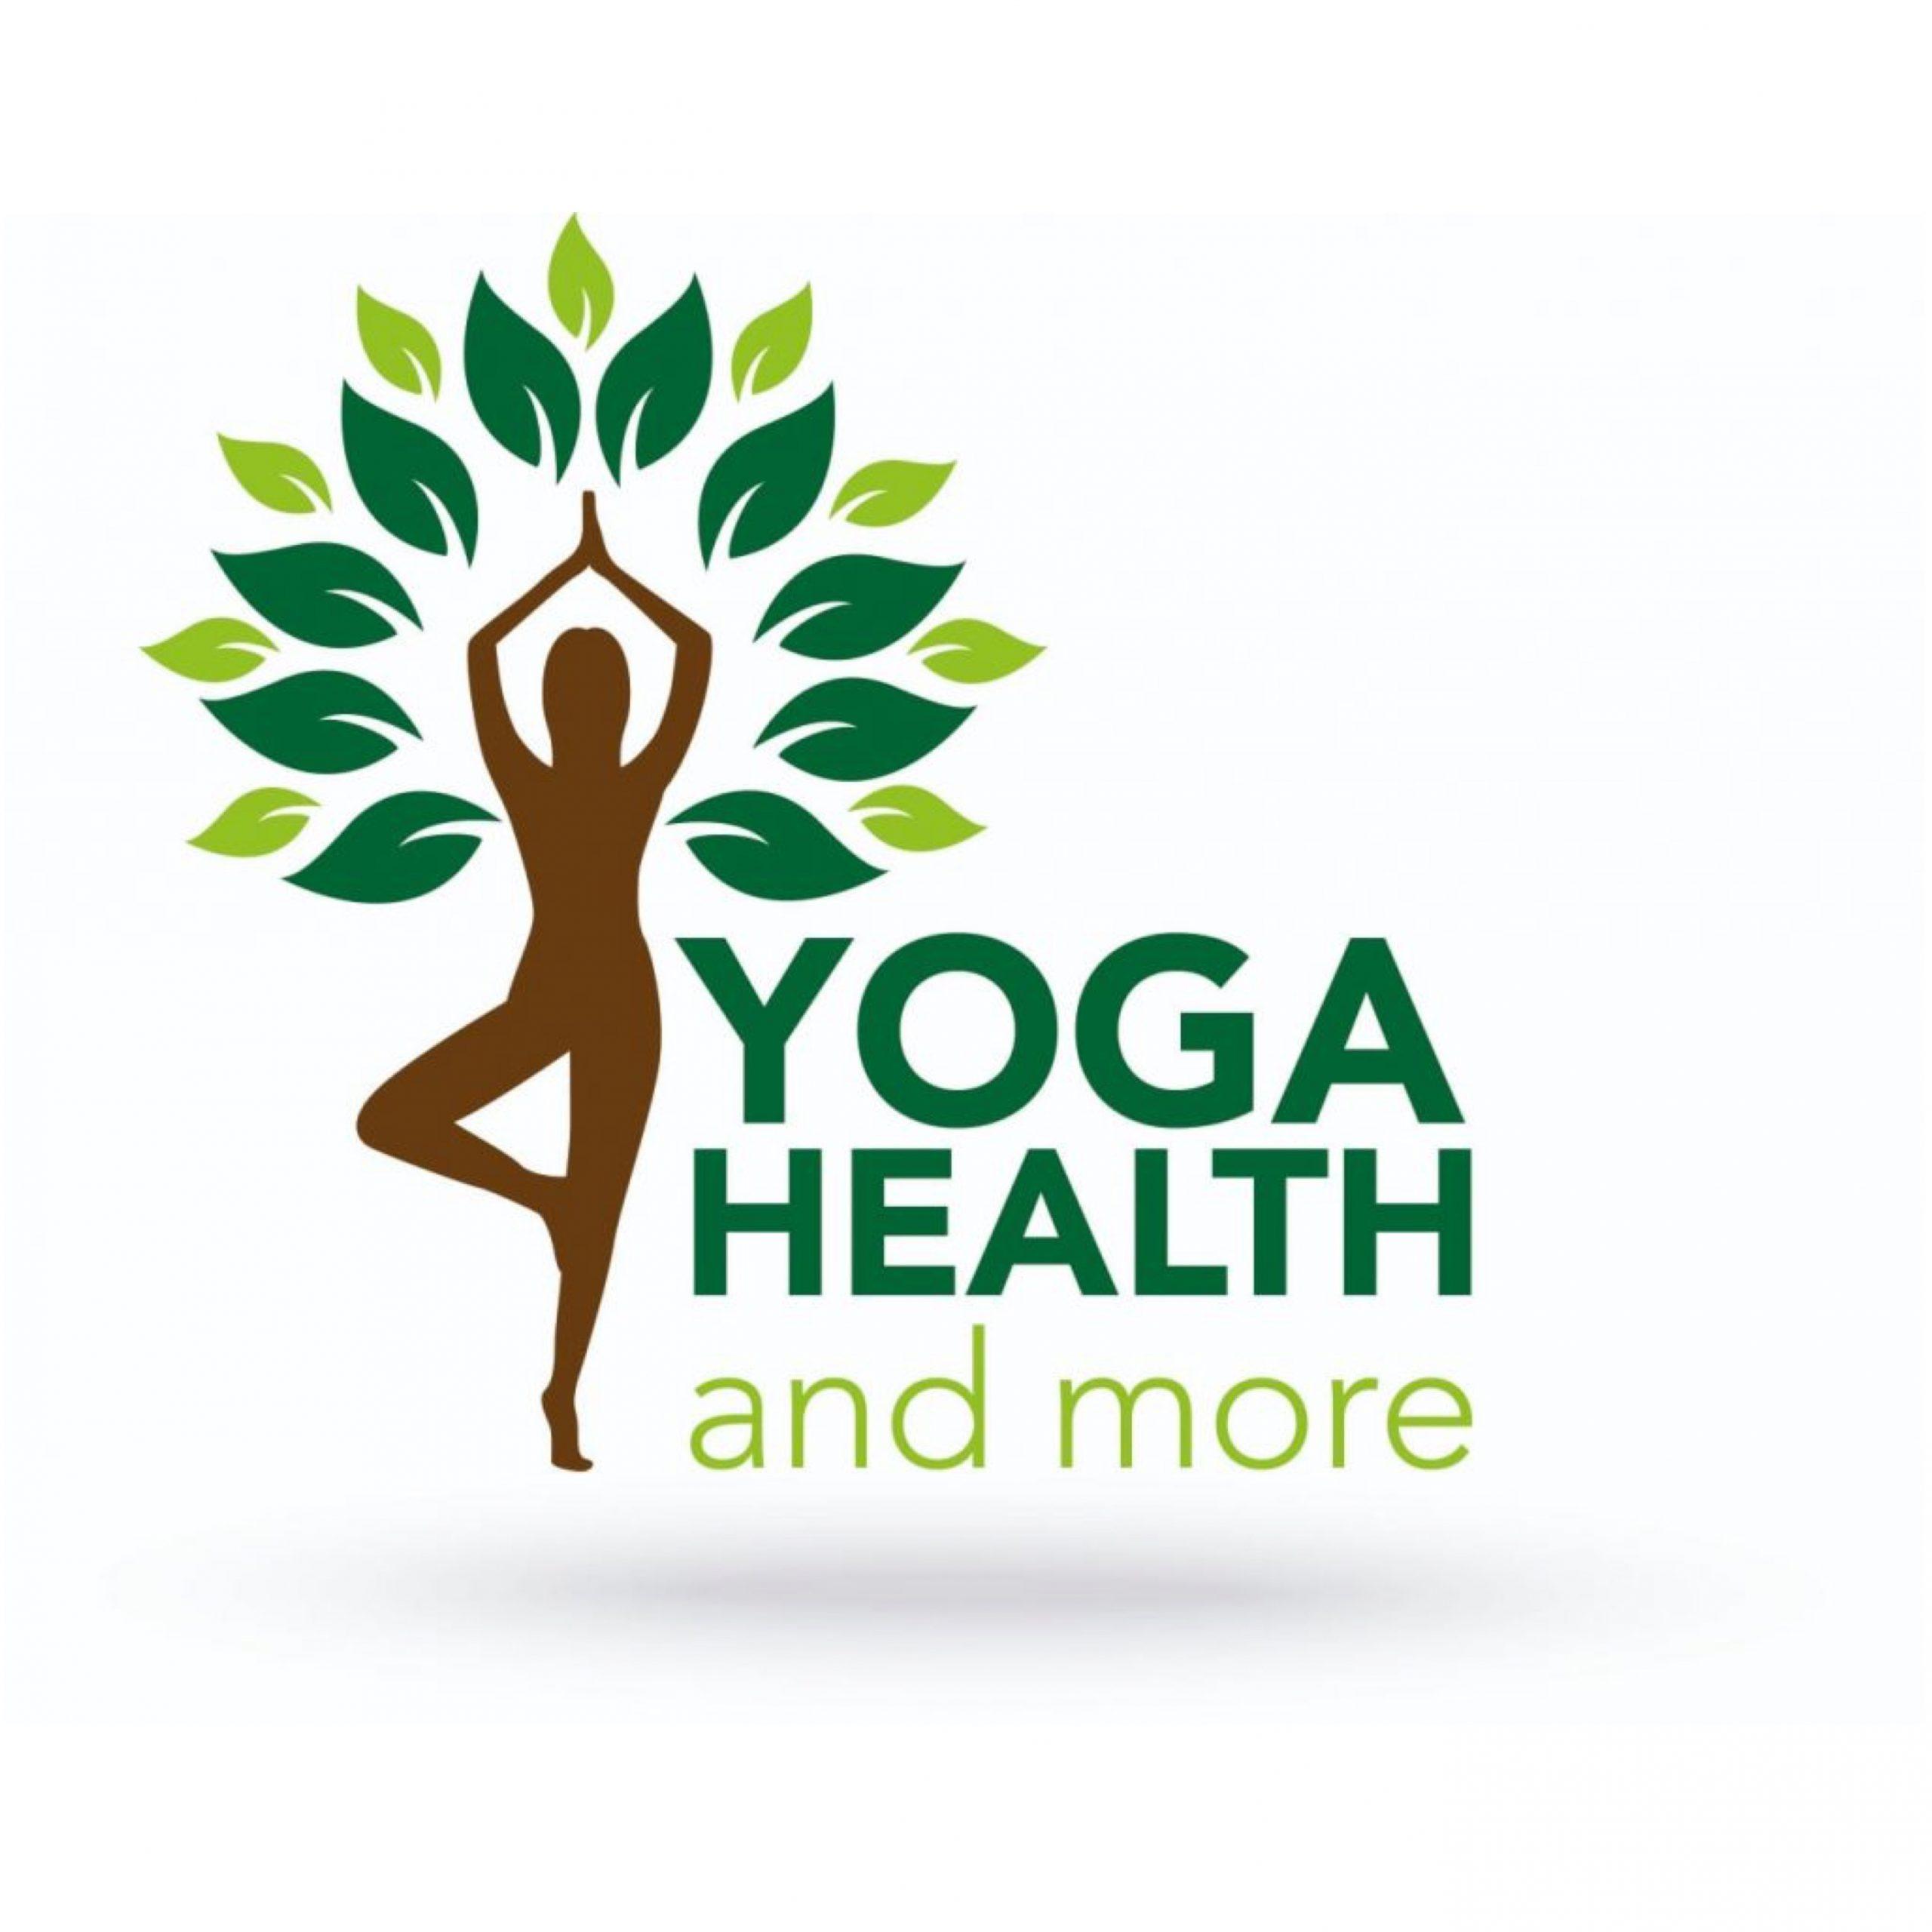 yogastudio01 scaled